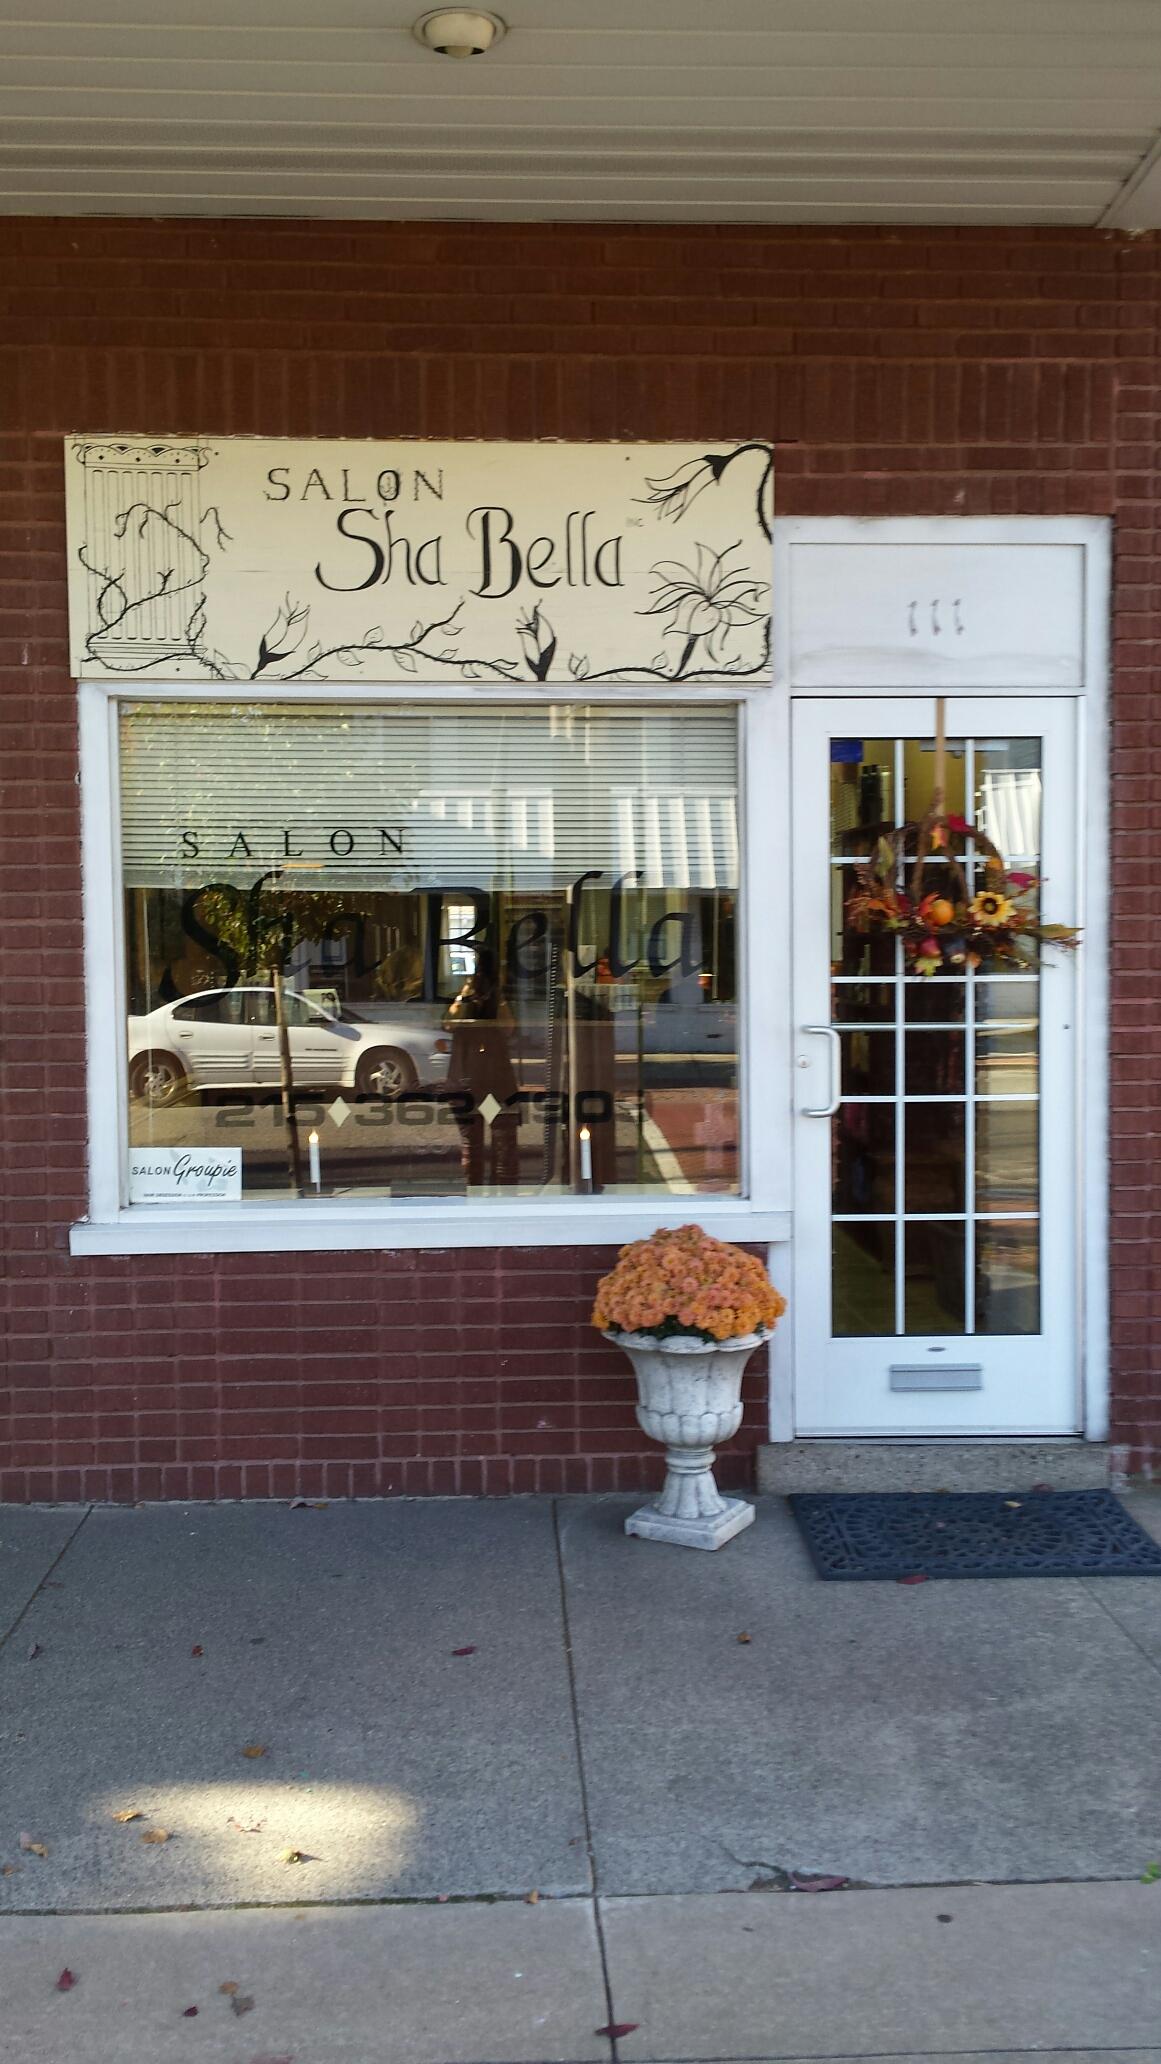 Salon Shabella, Hatfield PA